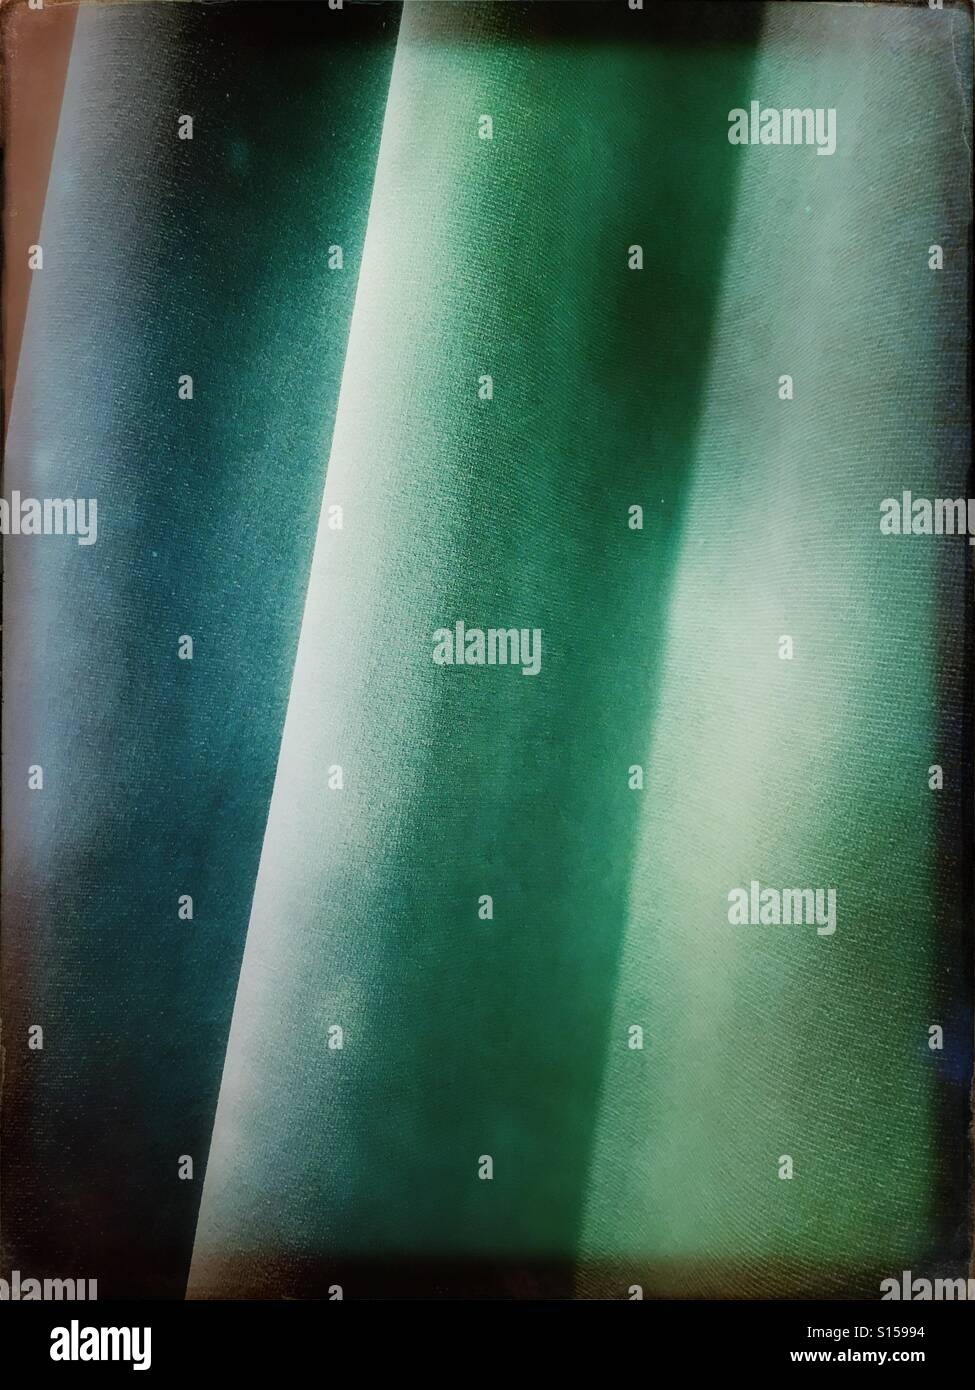 Velvet curtain fabric - Stock Image